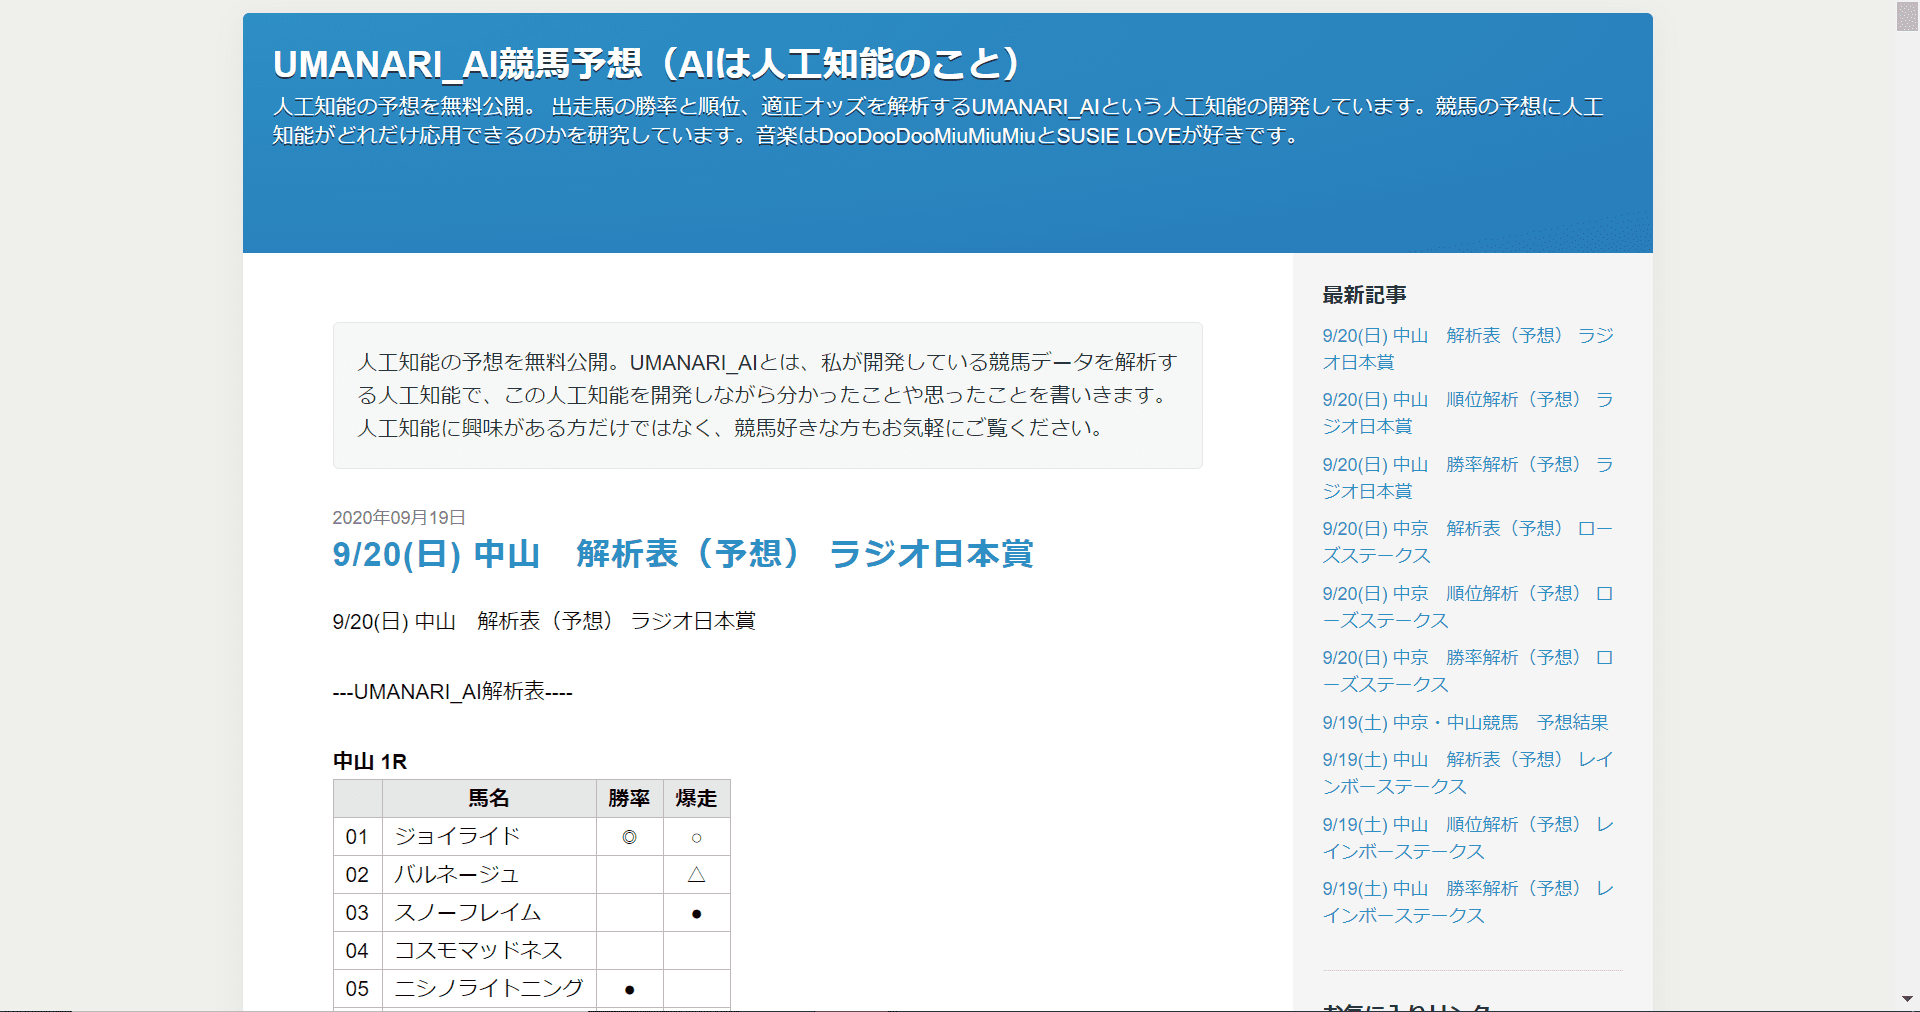 UMANARI_AI競馬予想 トップ